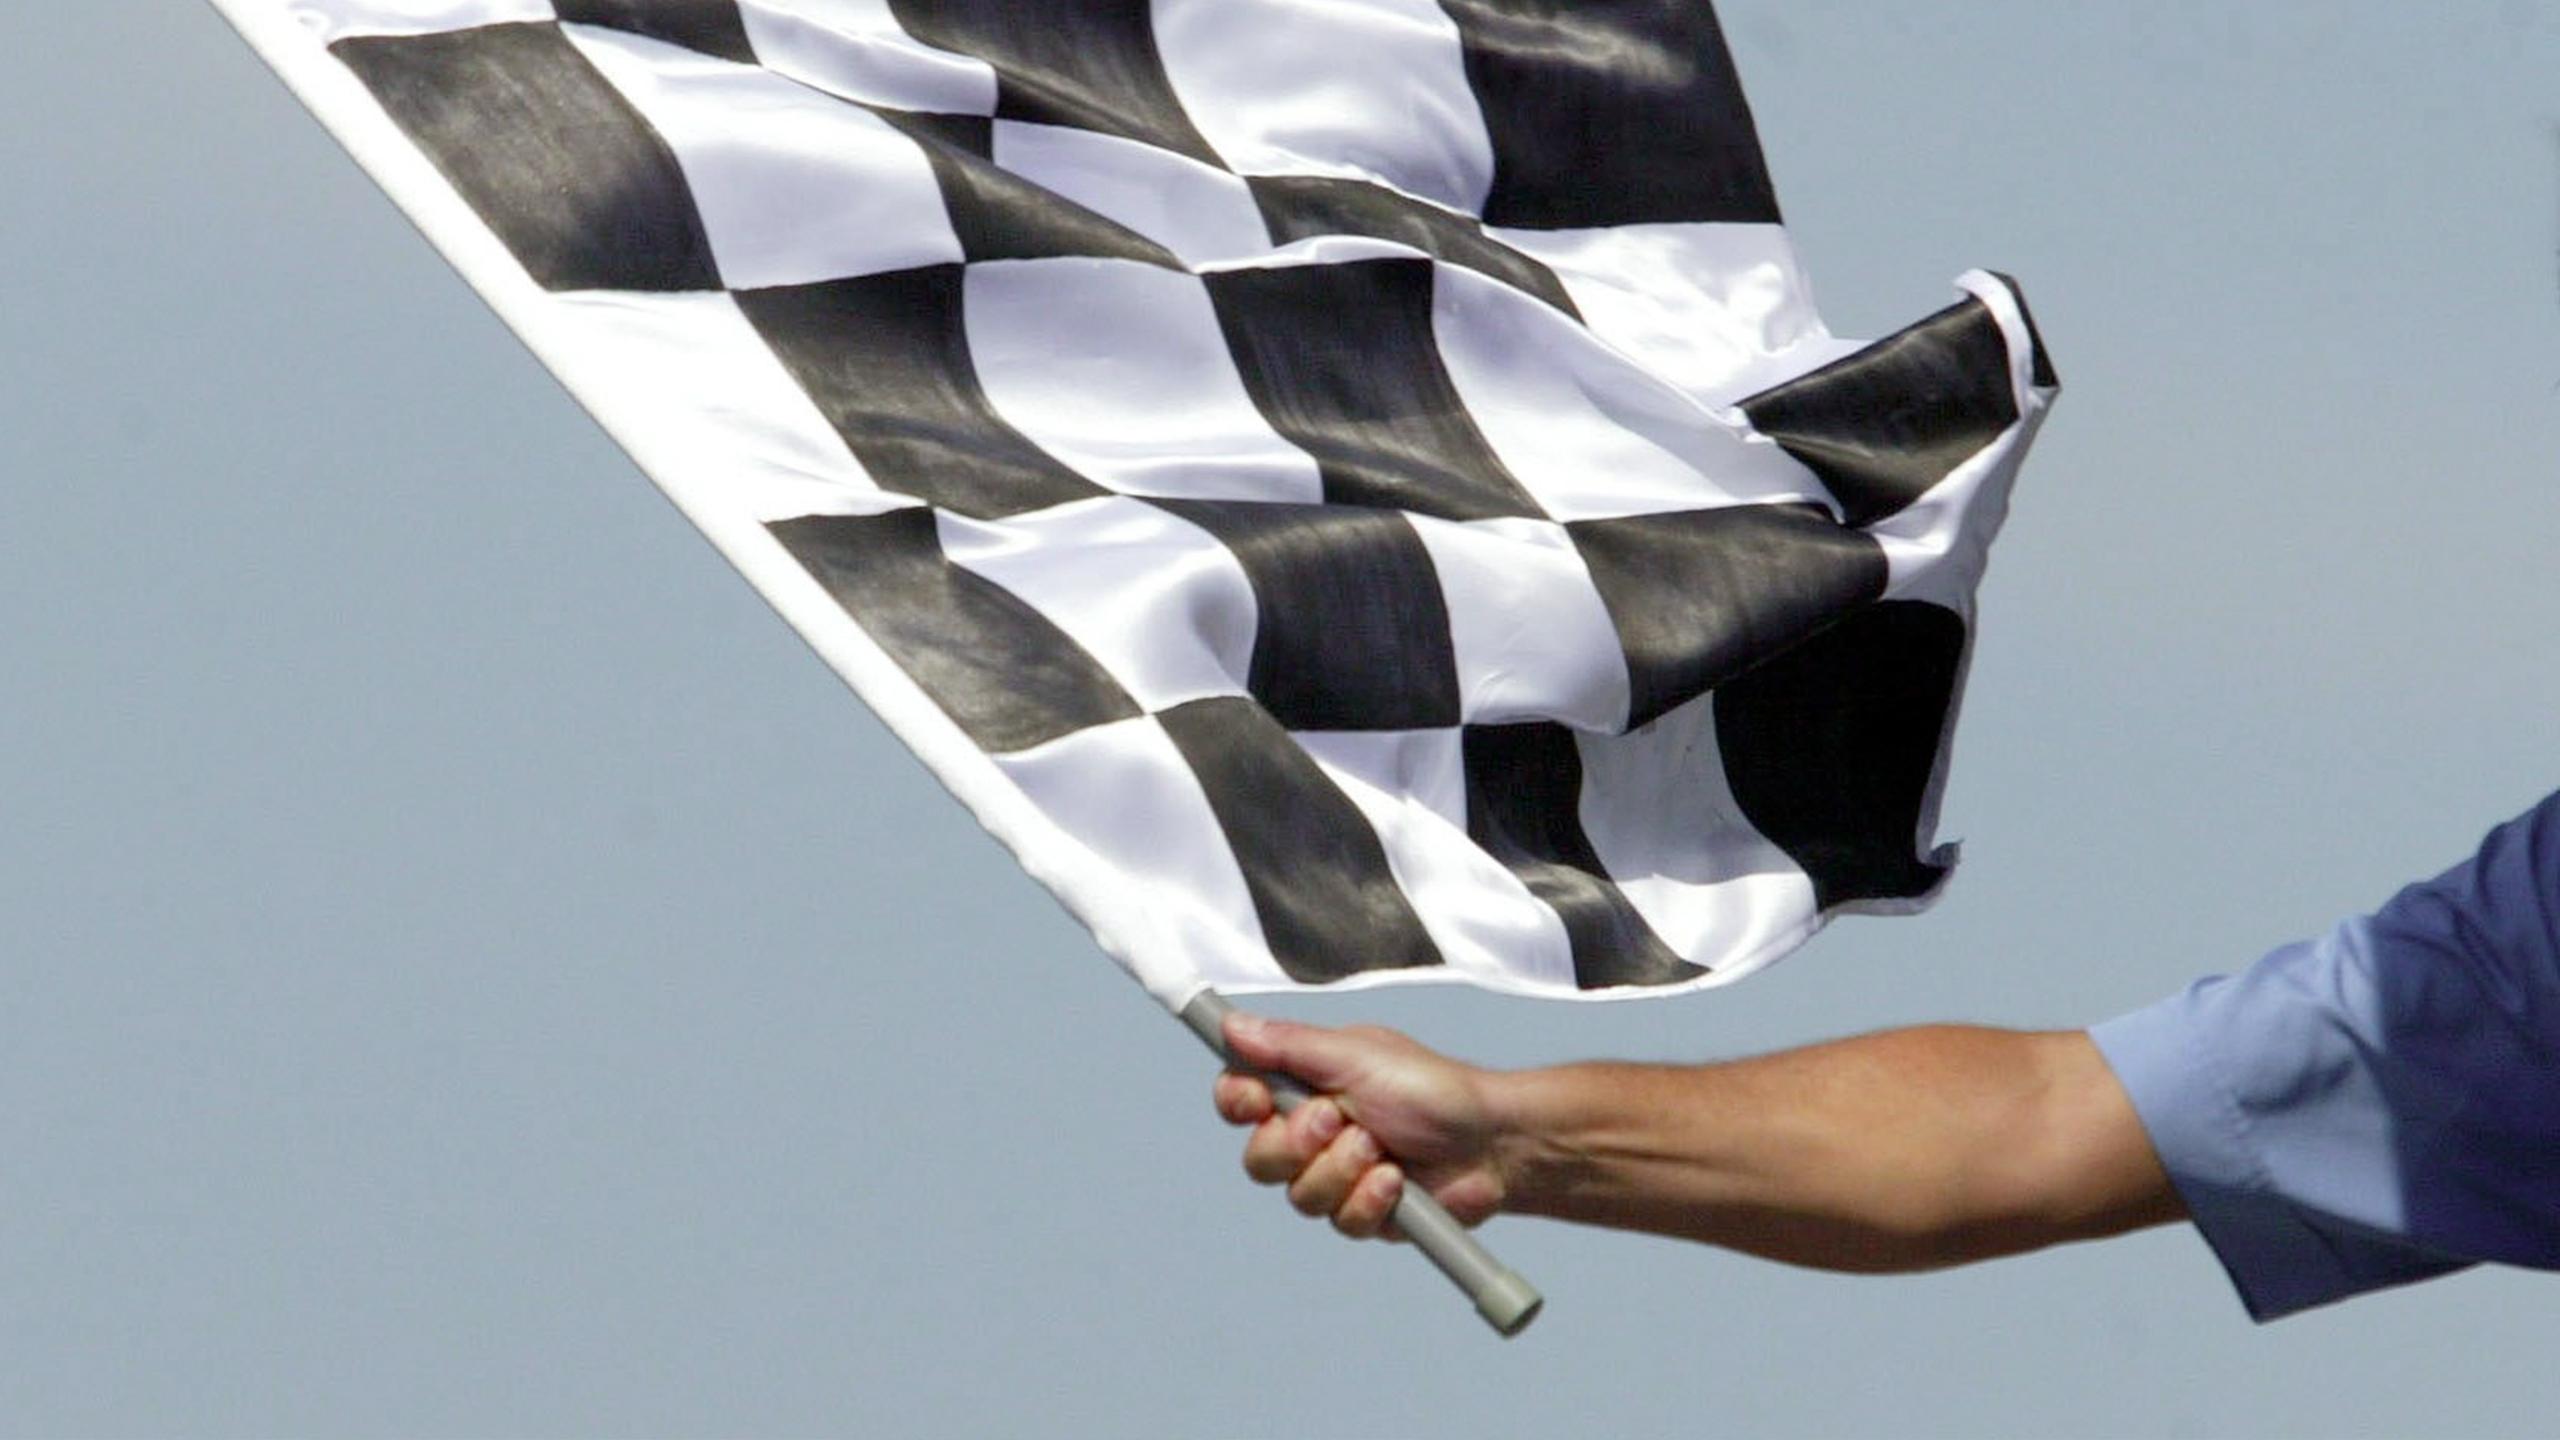 Formula 1 Pirelli United States Grand Prix coverage presented by Mothers Polish